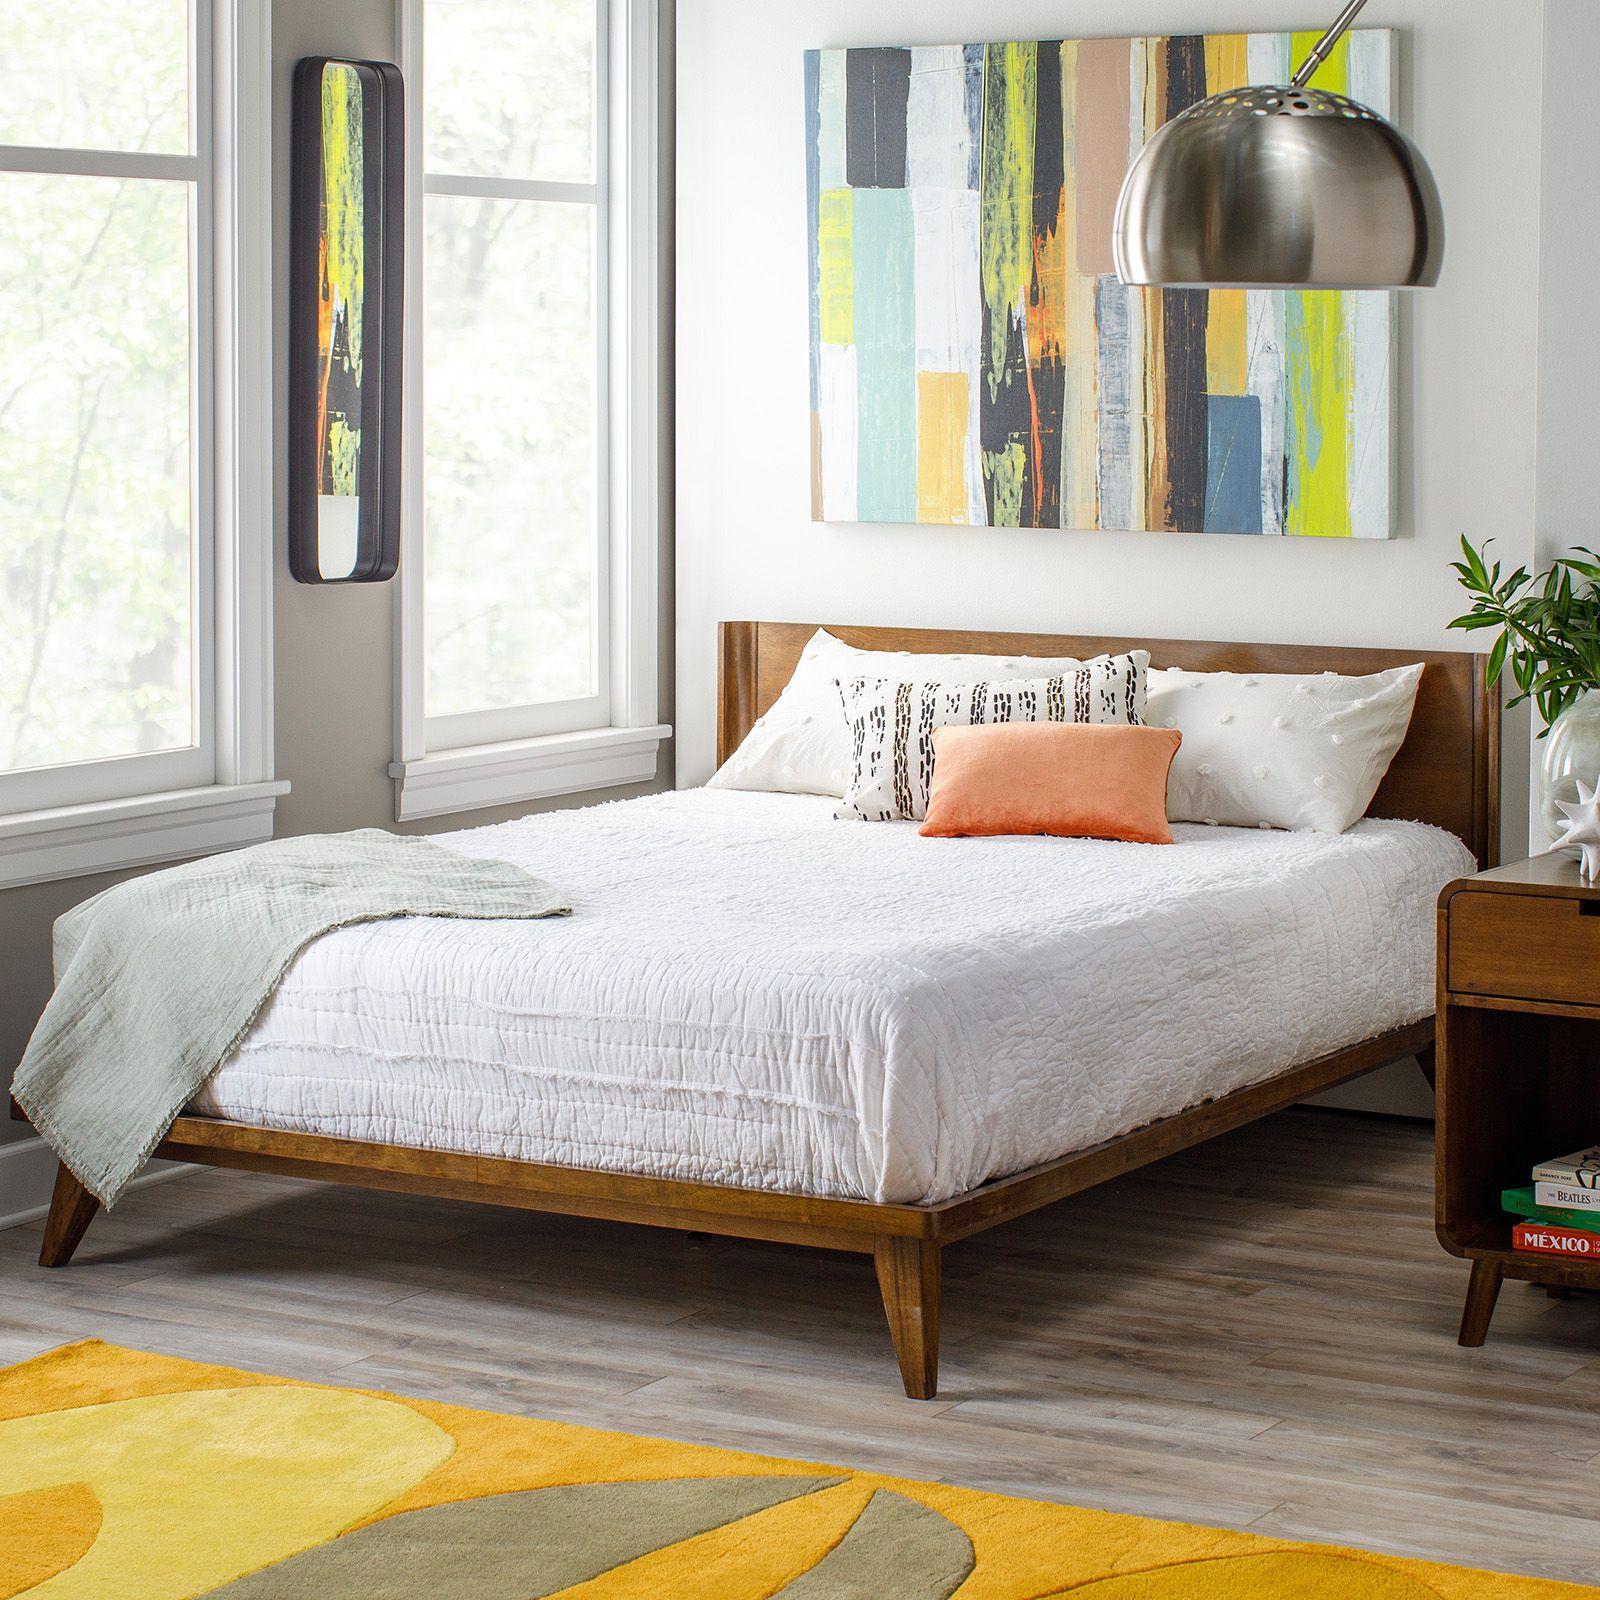 Platform Bed vs. Box Springs How to Choose Bedroom